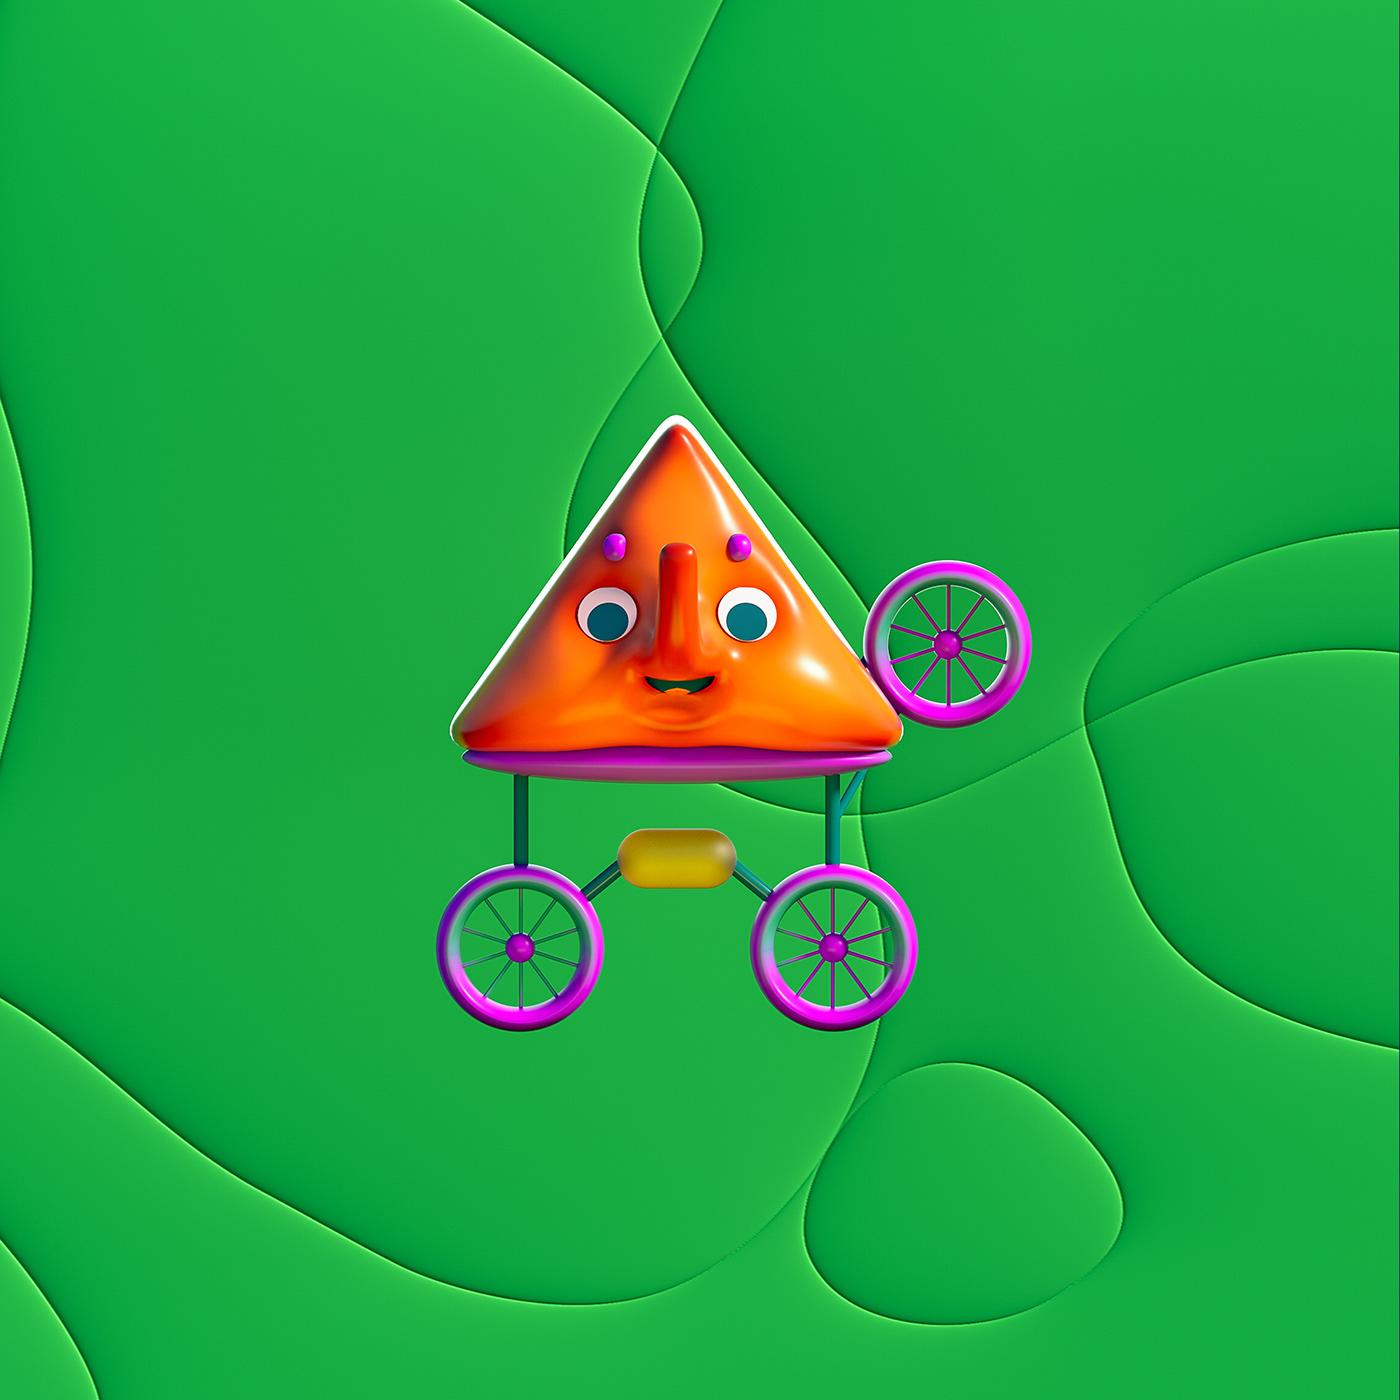 Image may contain: cartoon, child art and screenshot